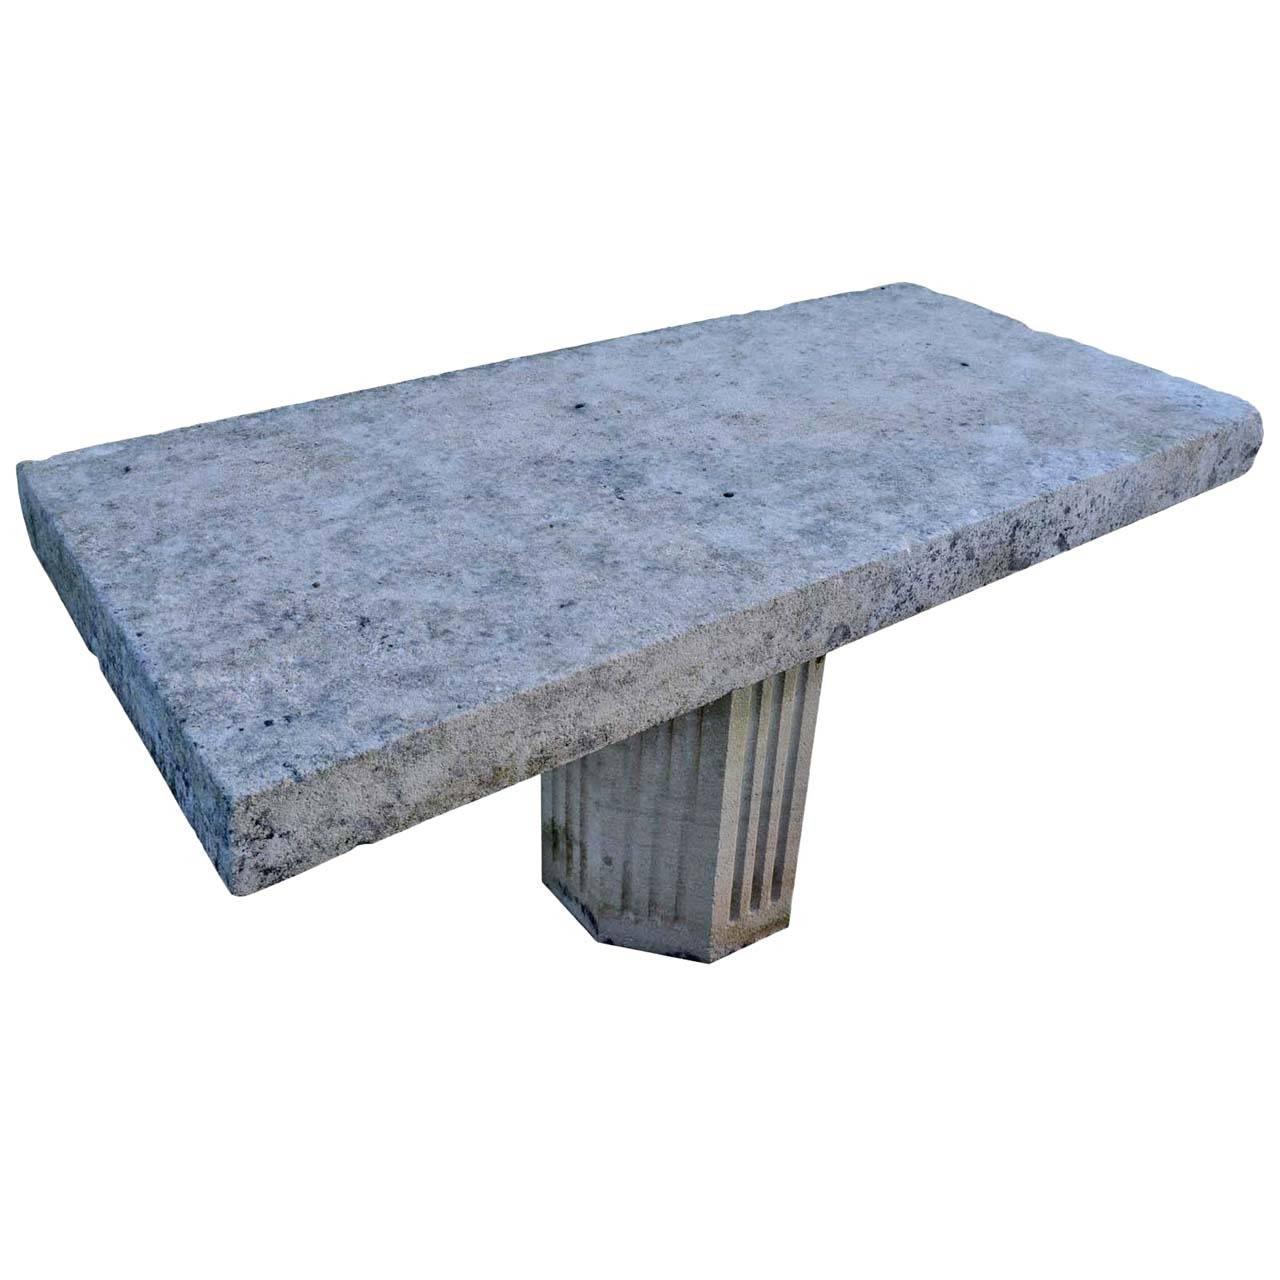 Stone garden table - 20th Century 1